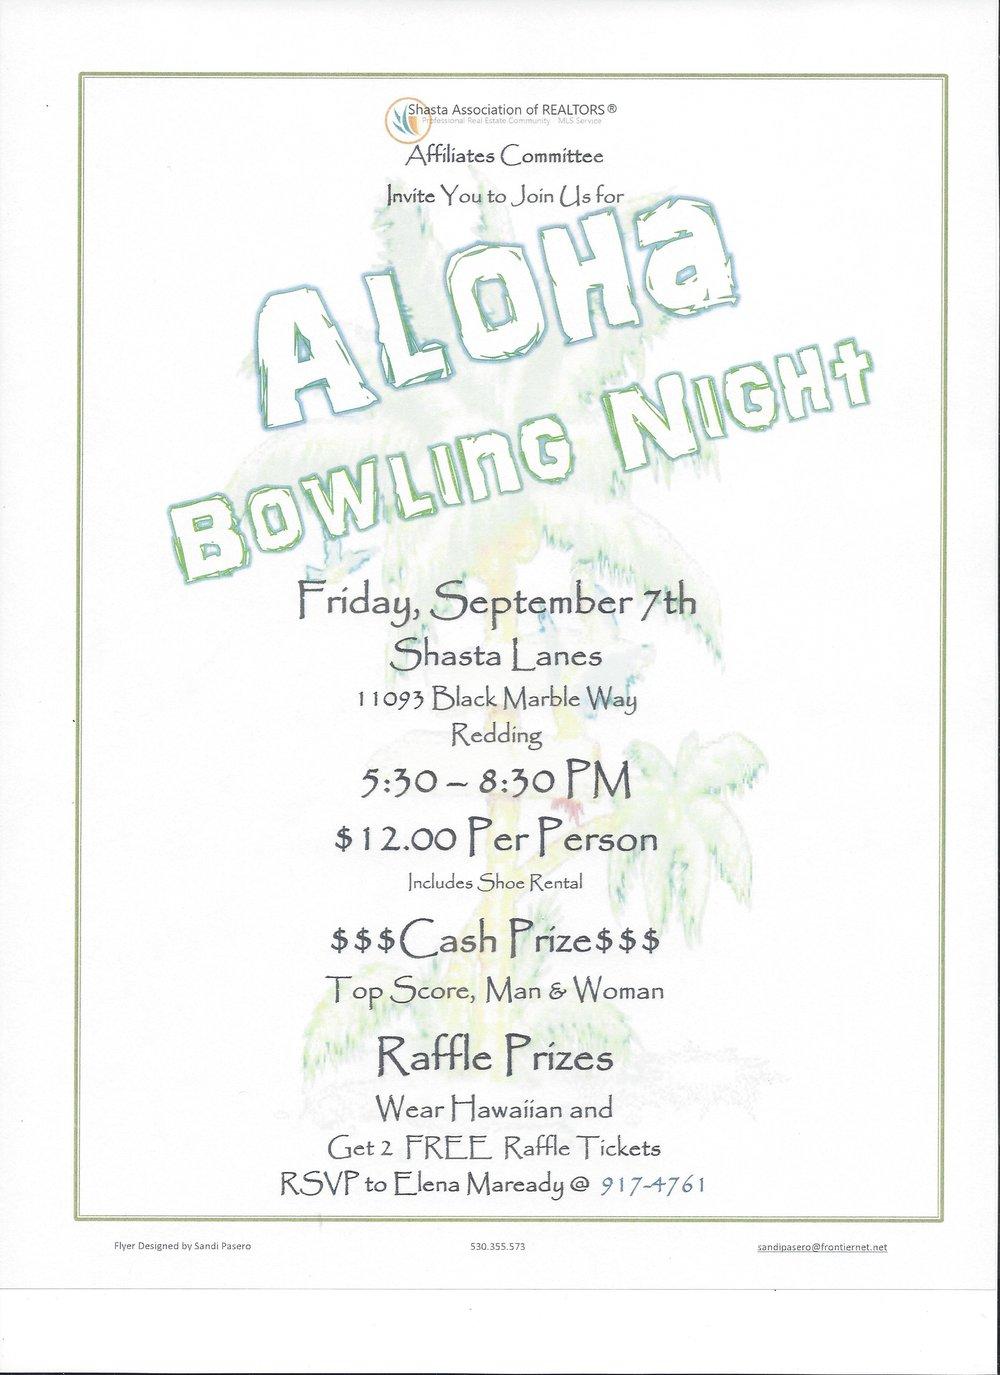 18-08-10;Aloha Bowling Night 2018 (Revised).jpg